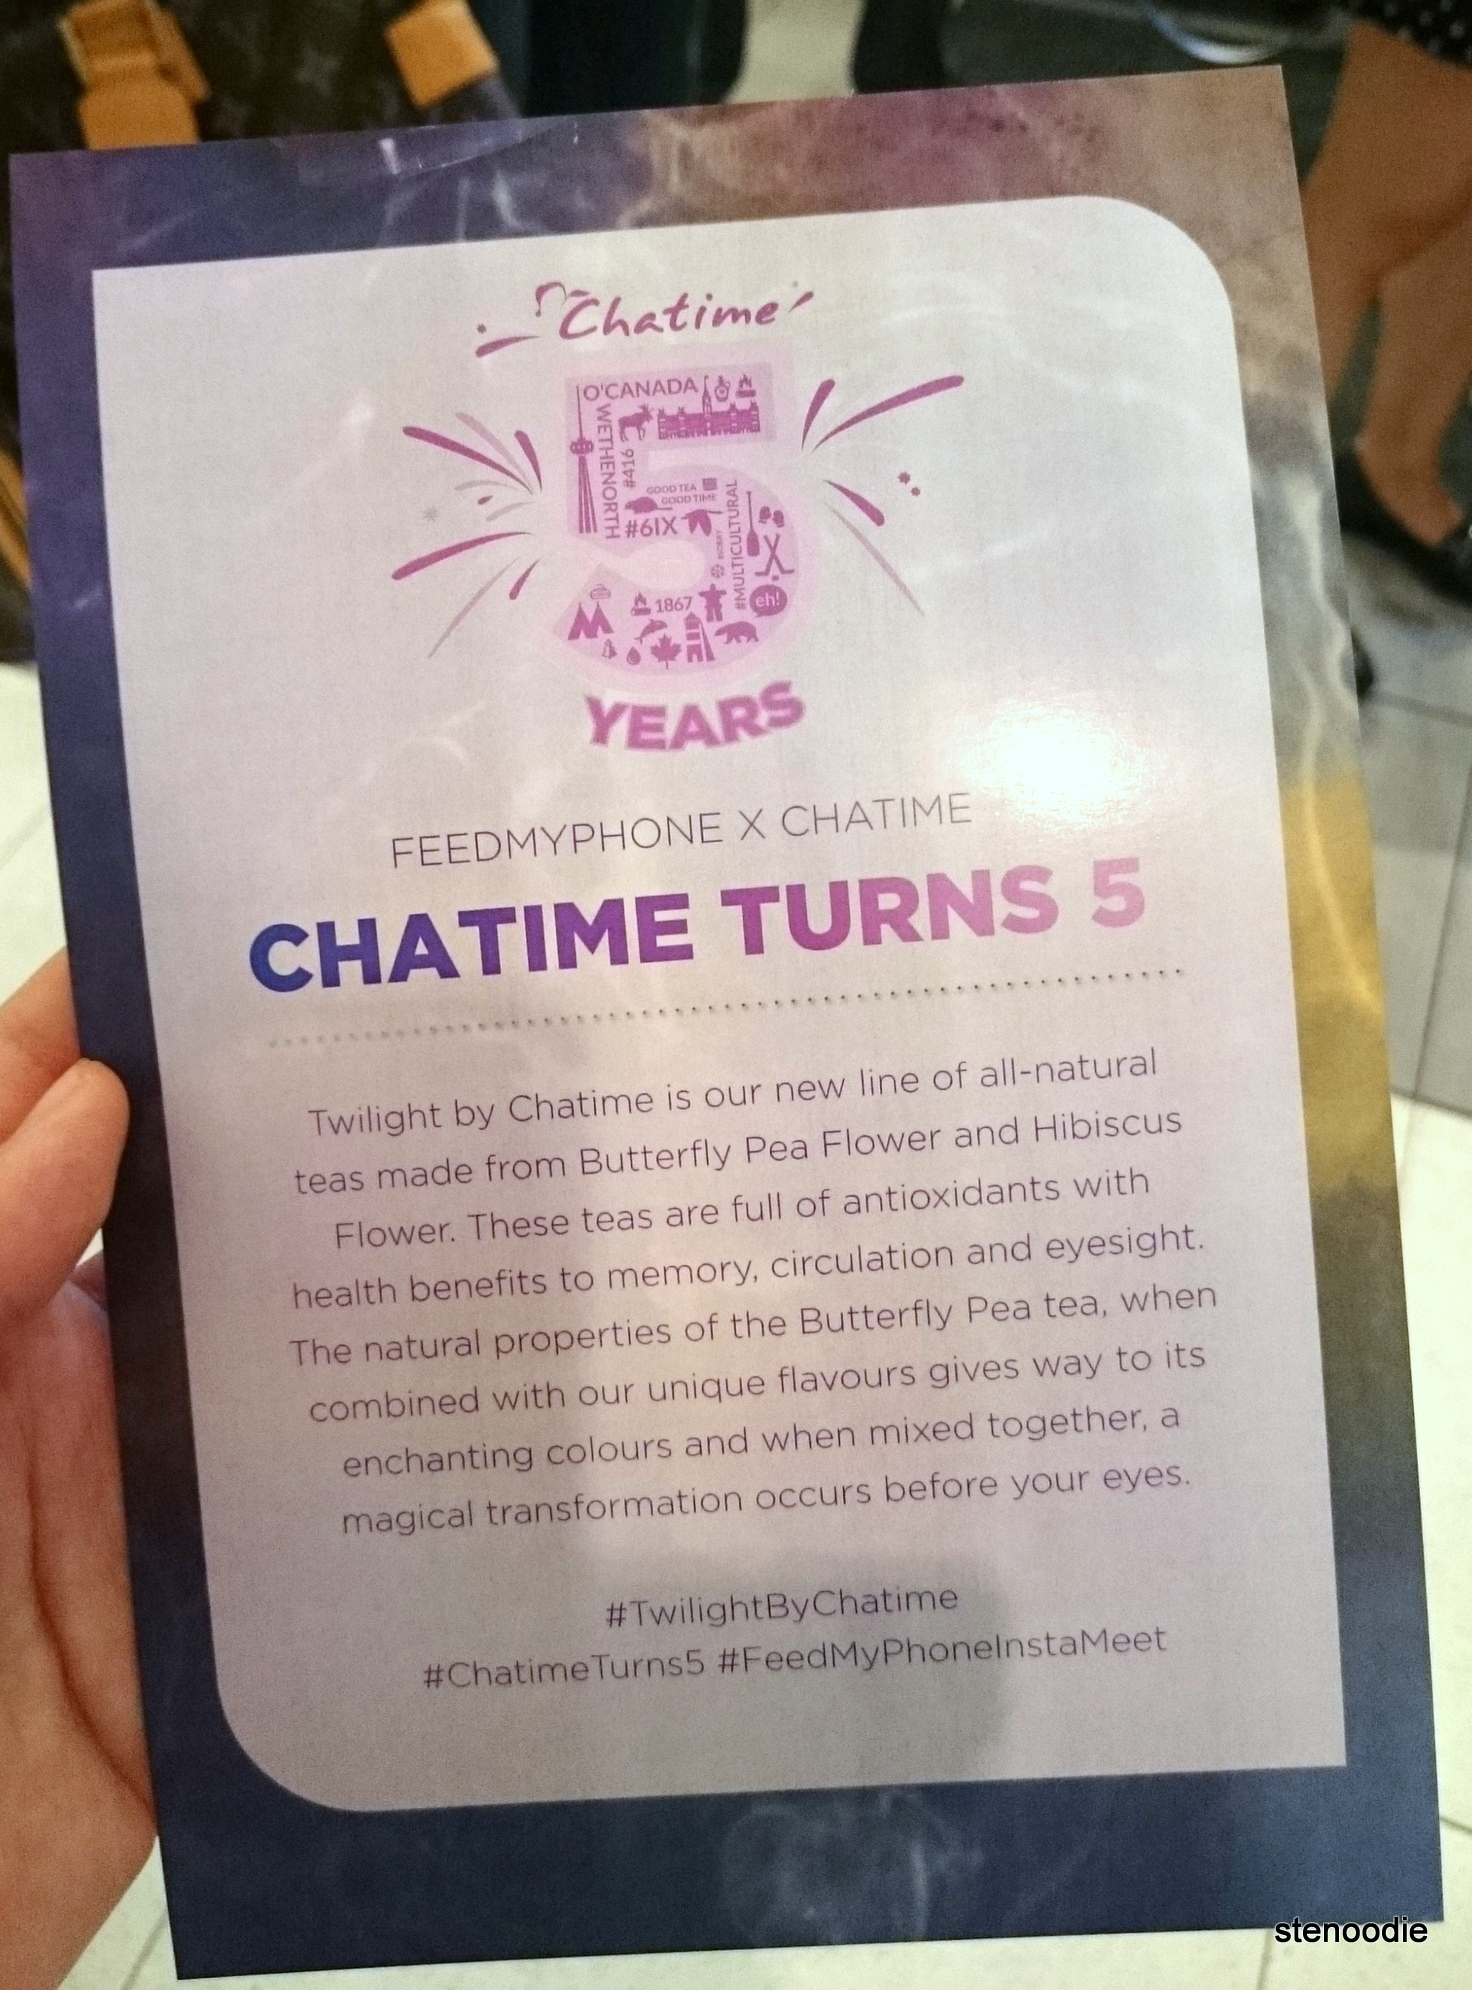 Chatime turns 5